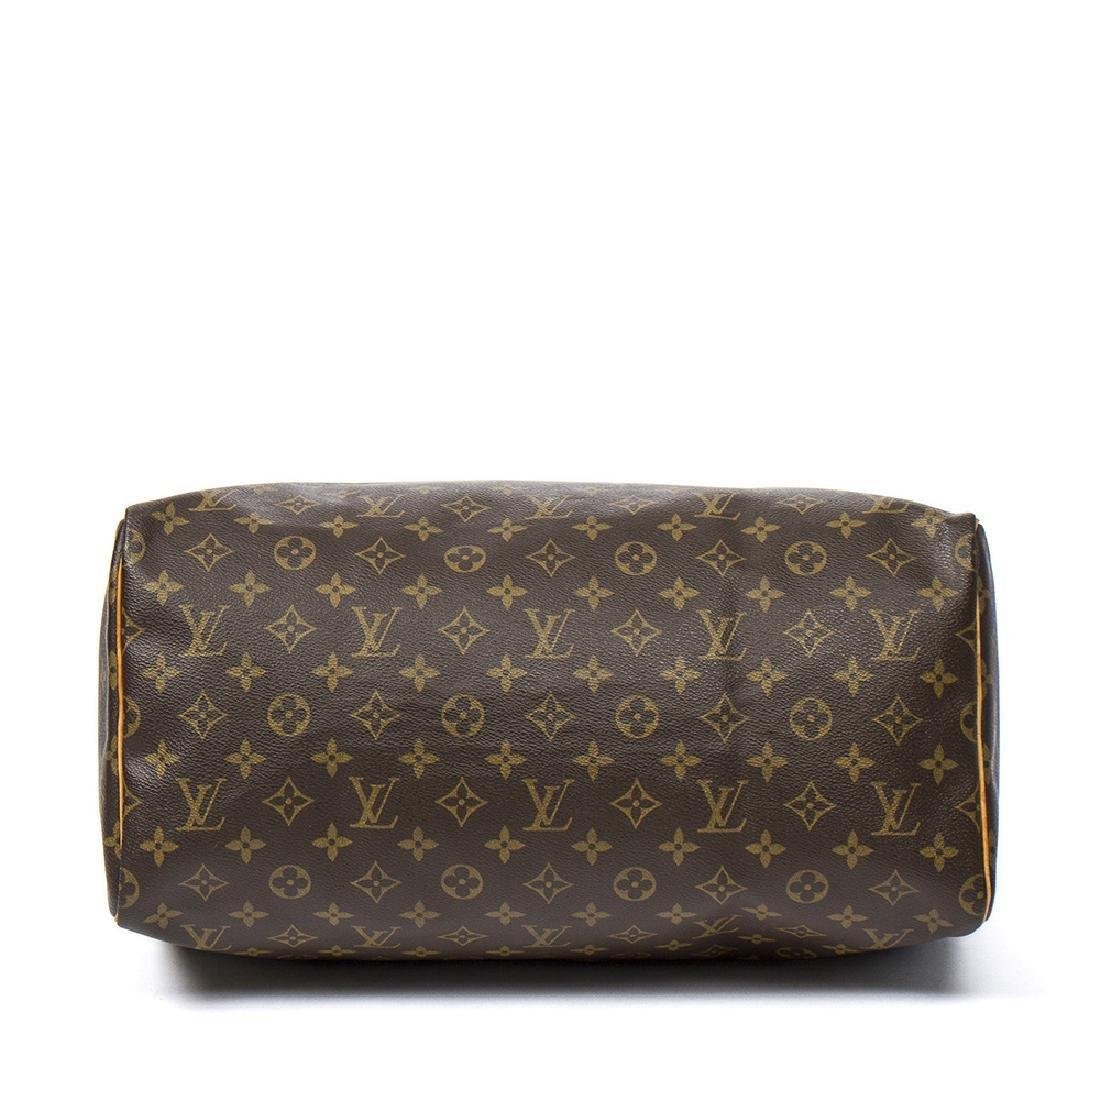 Louis Vuitton Speedy - 7